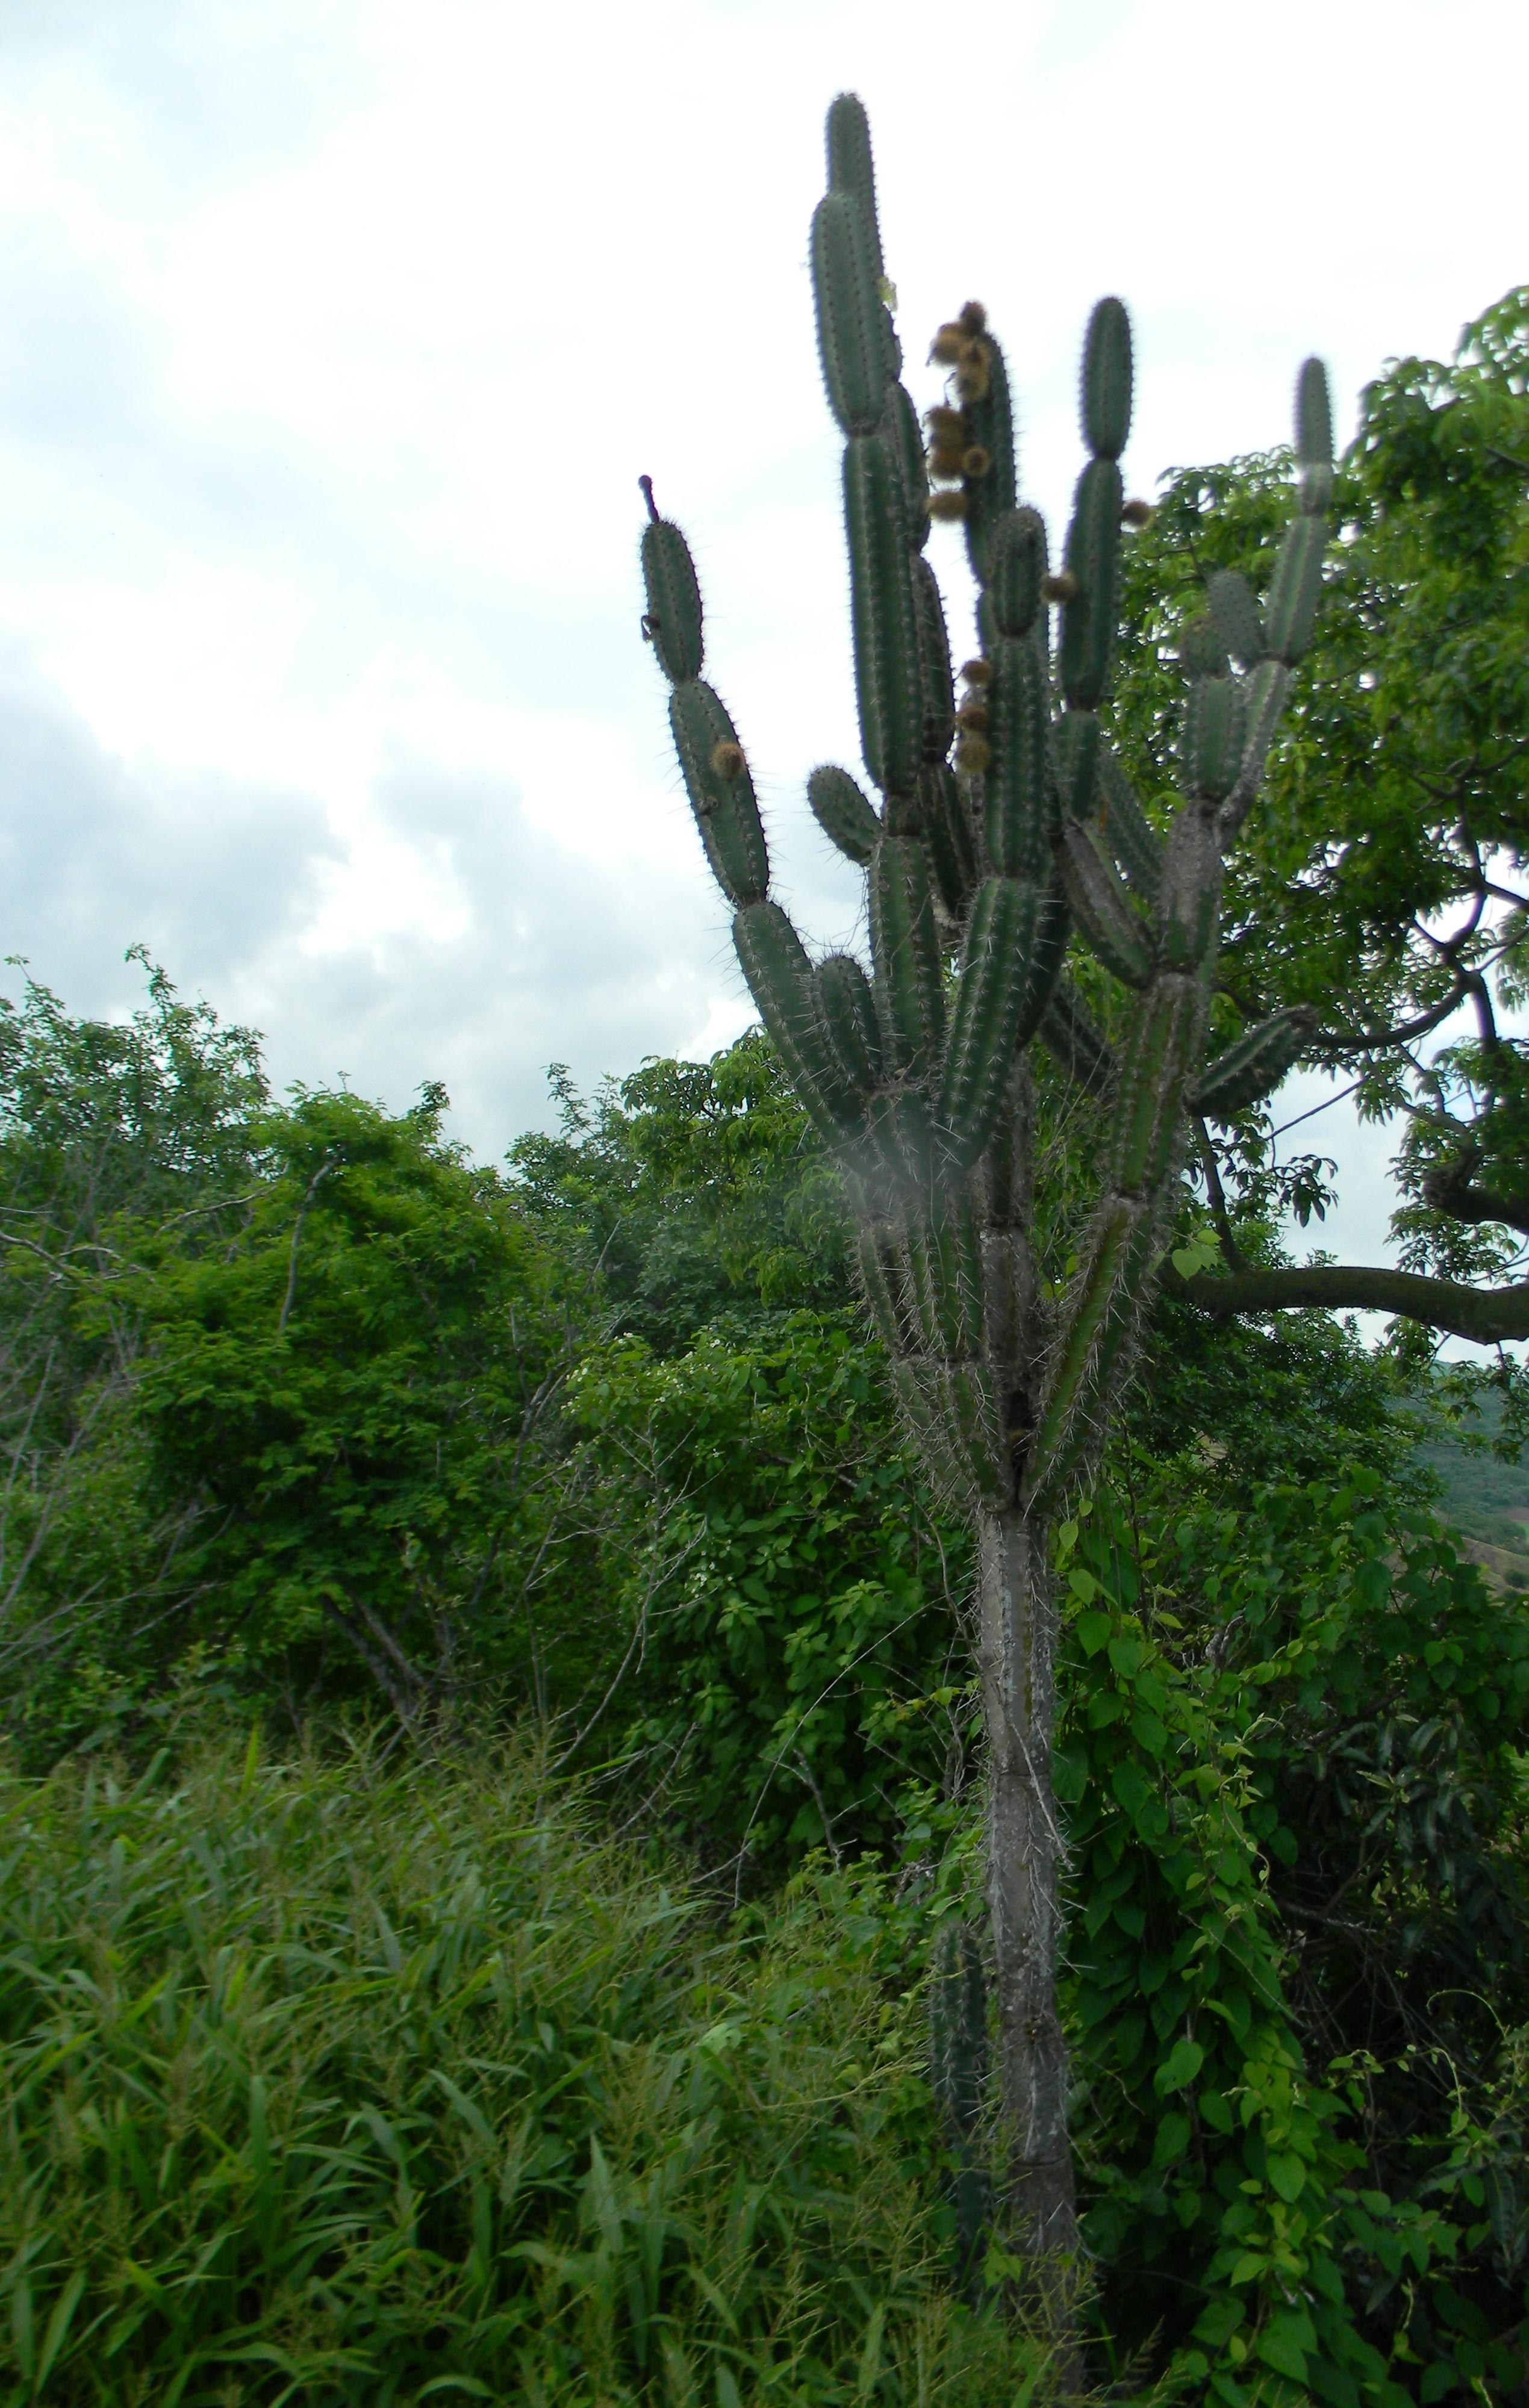 FileCactus de el Bosque Seco Tropicaljpg Wikimedia Commons